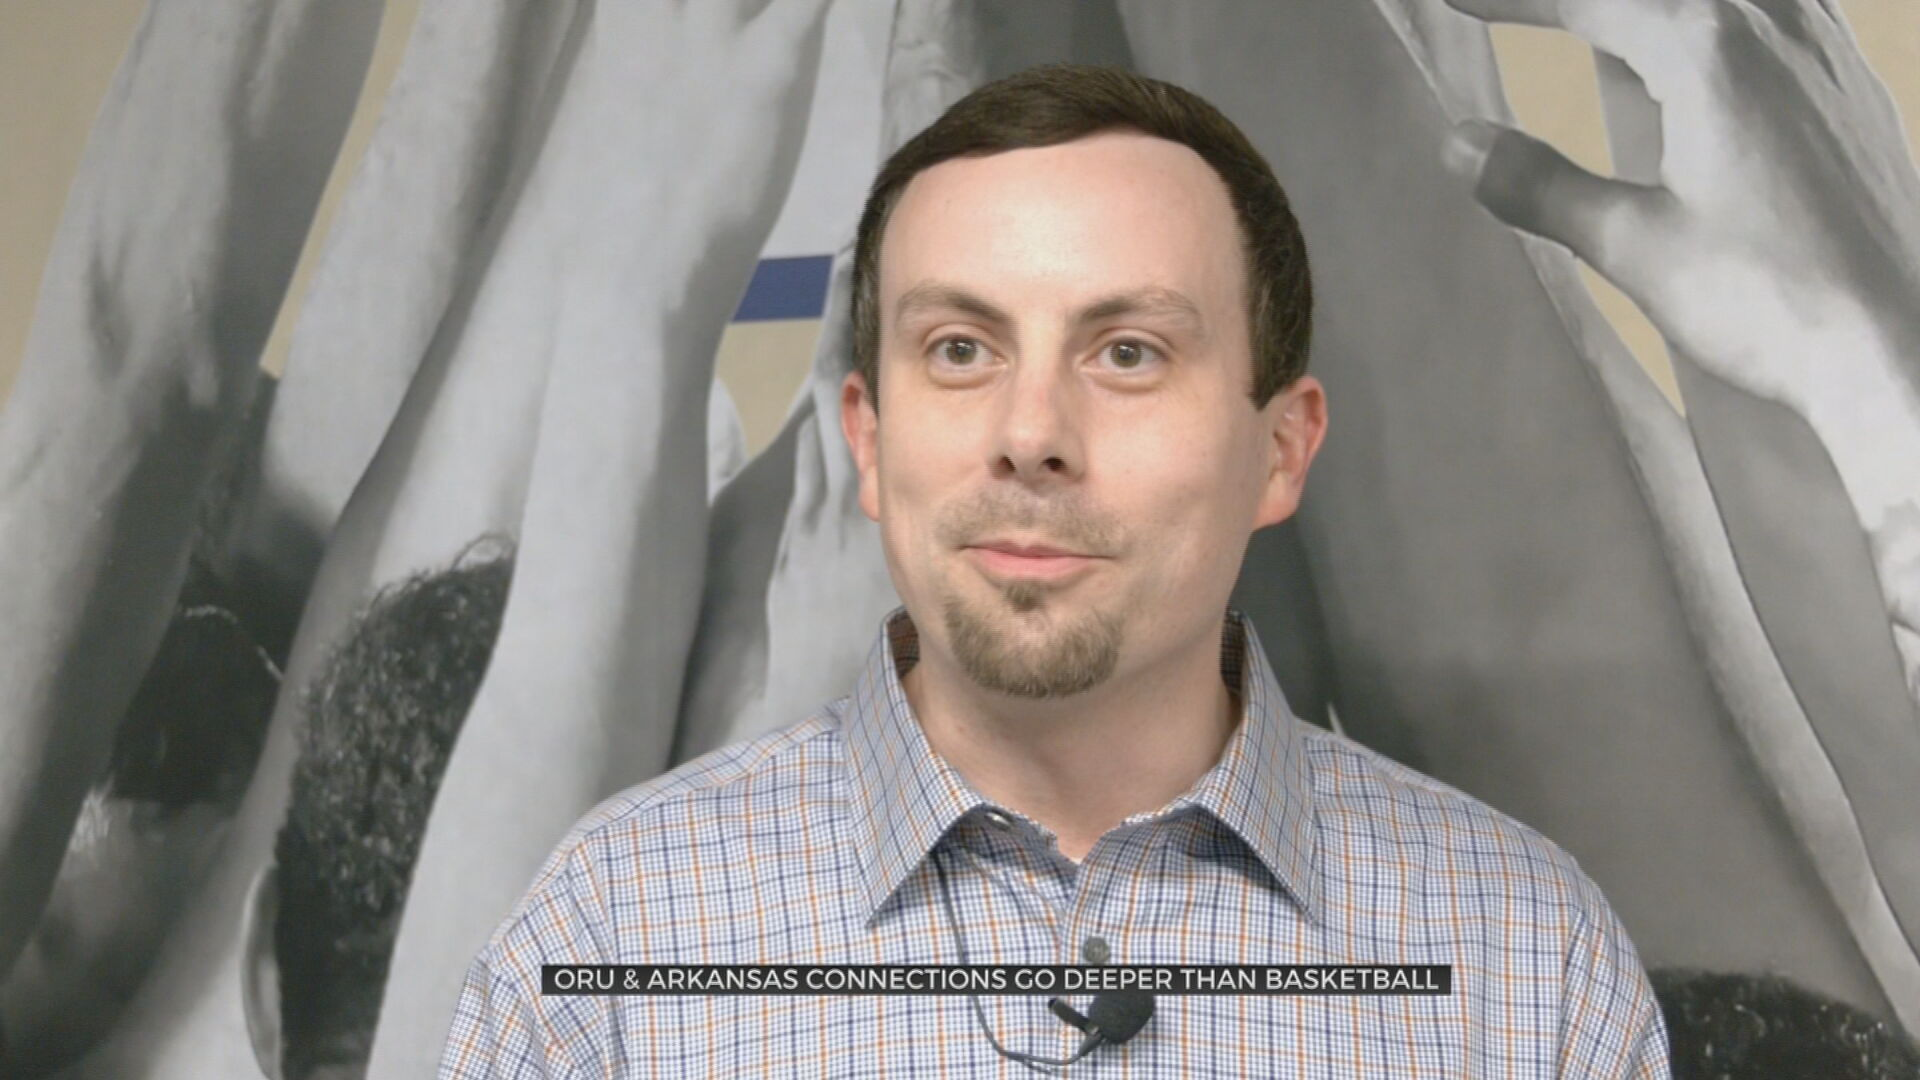 ORU & Arkansas Connections Run Deeper Than Basketball